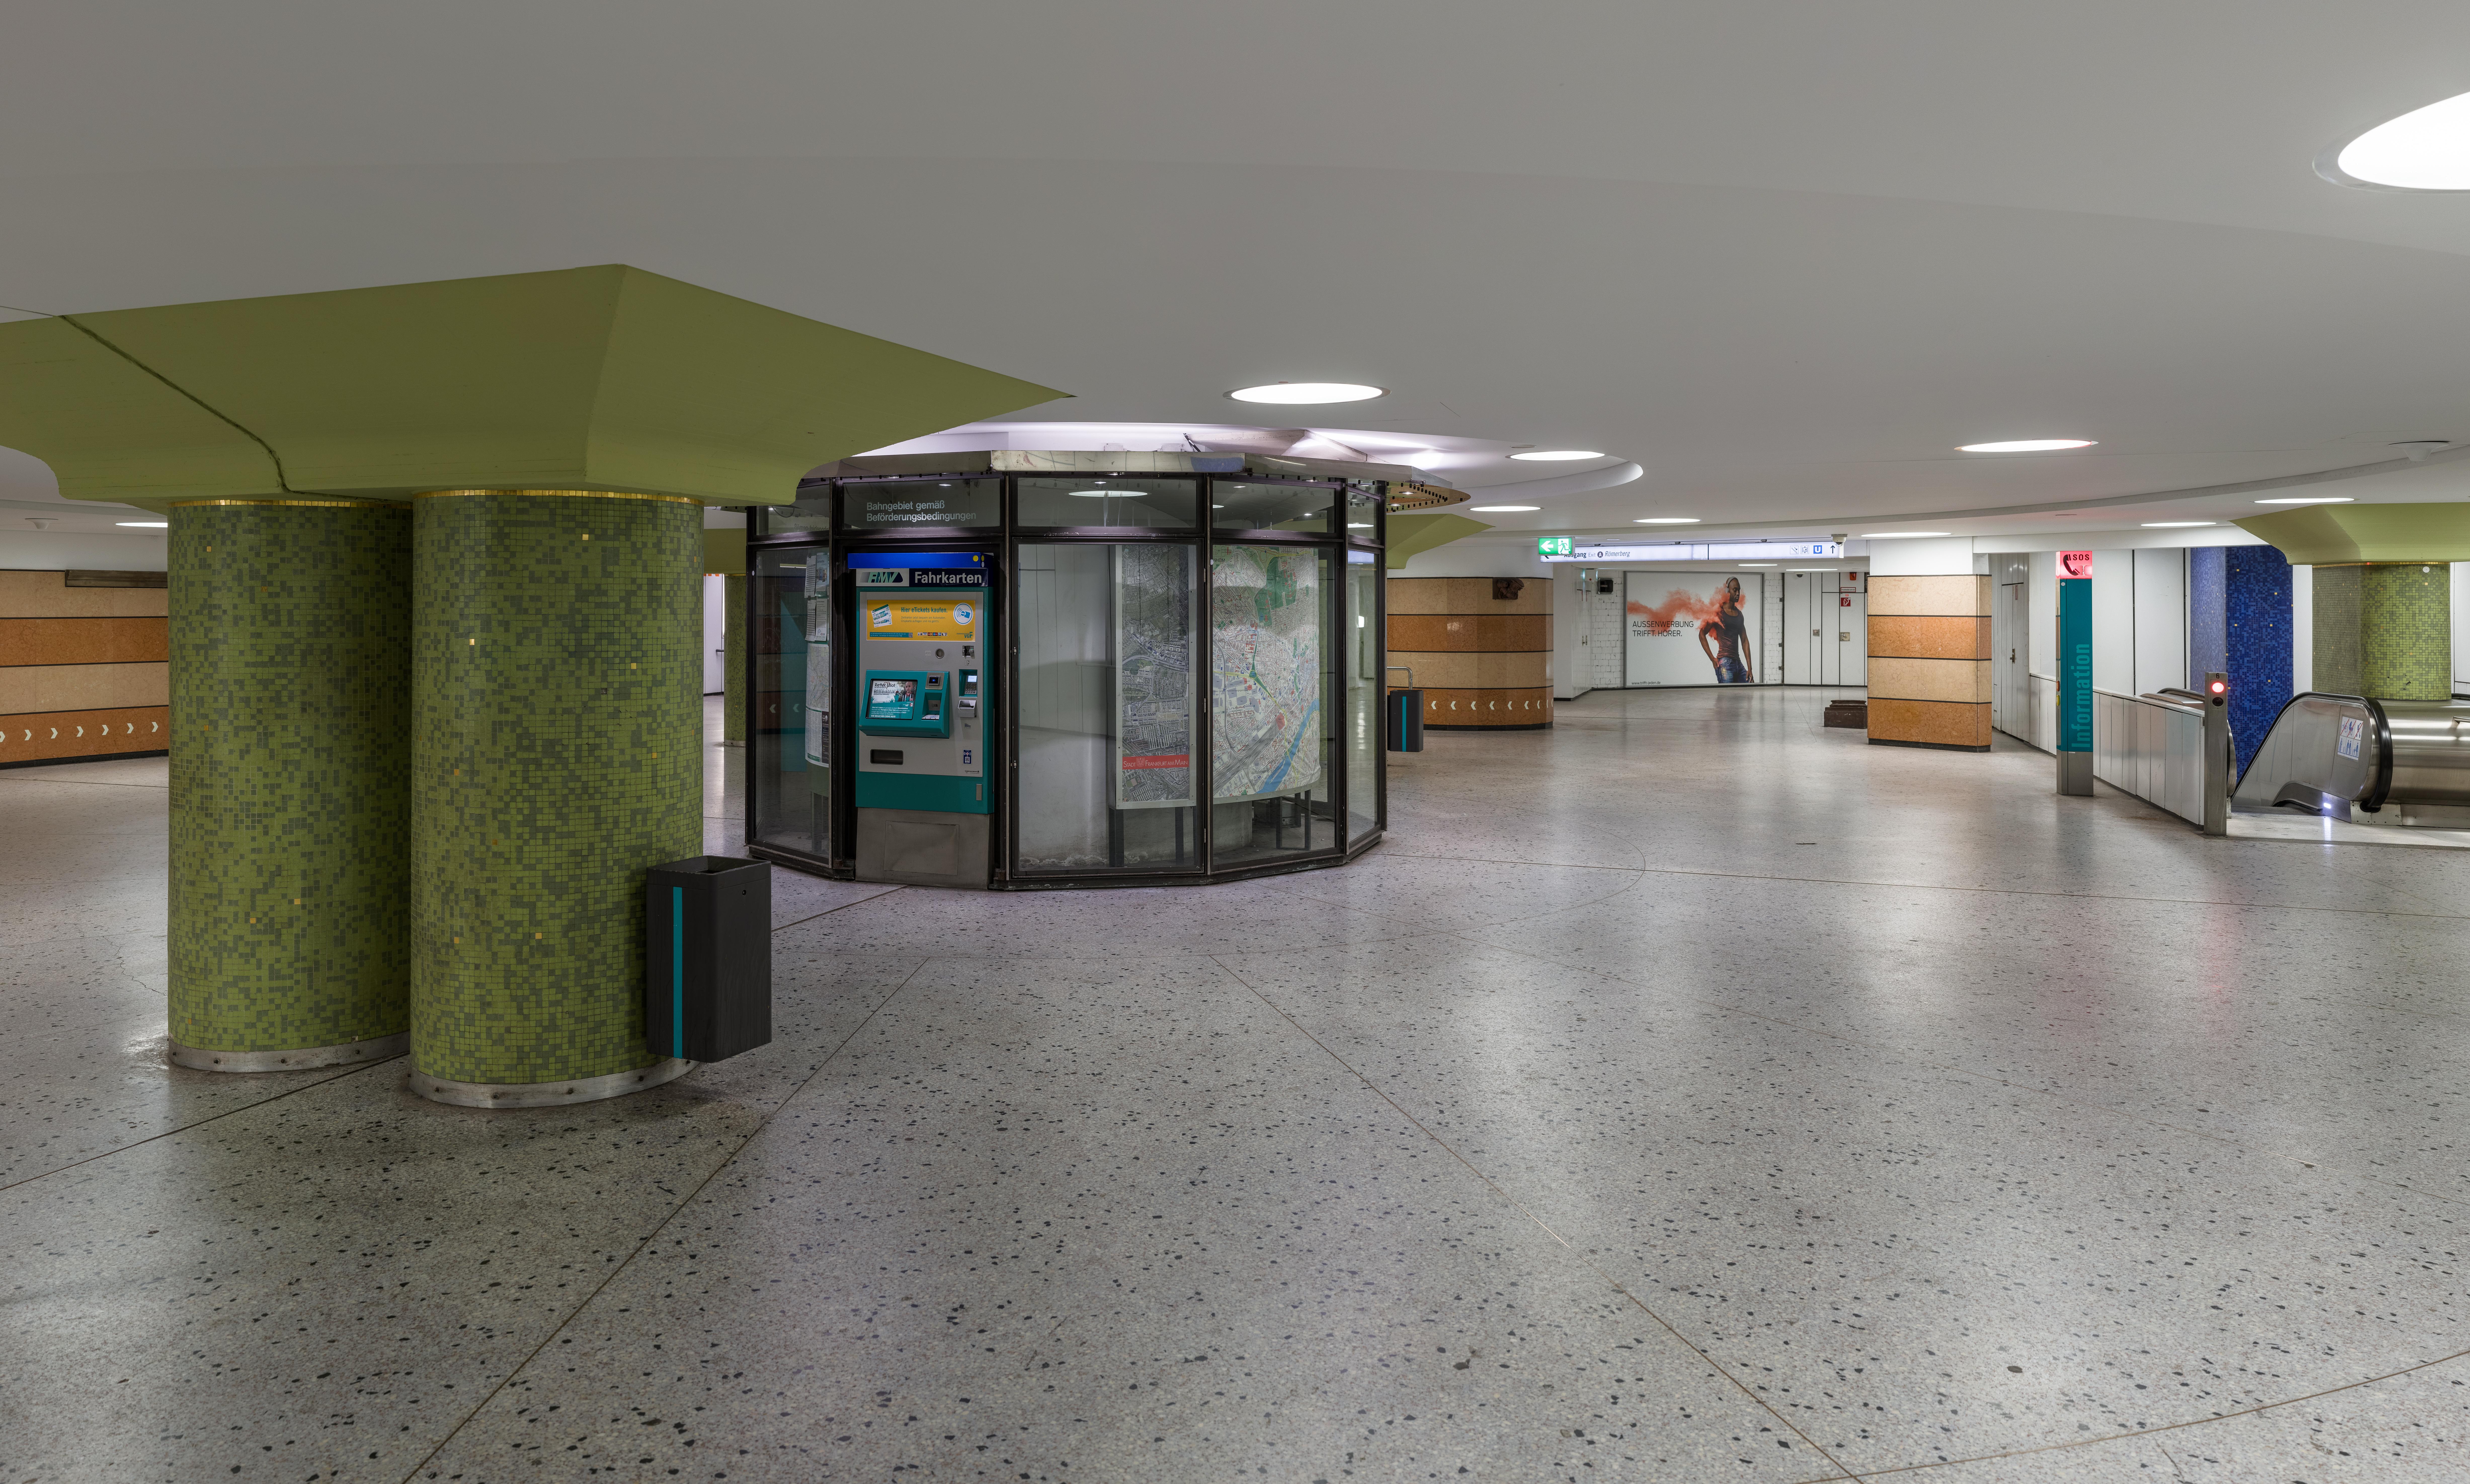 Datei:U-Bahnhof Dom-Römer, Frankfurt, Mezzanine 20190914 1 ...